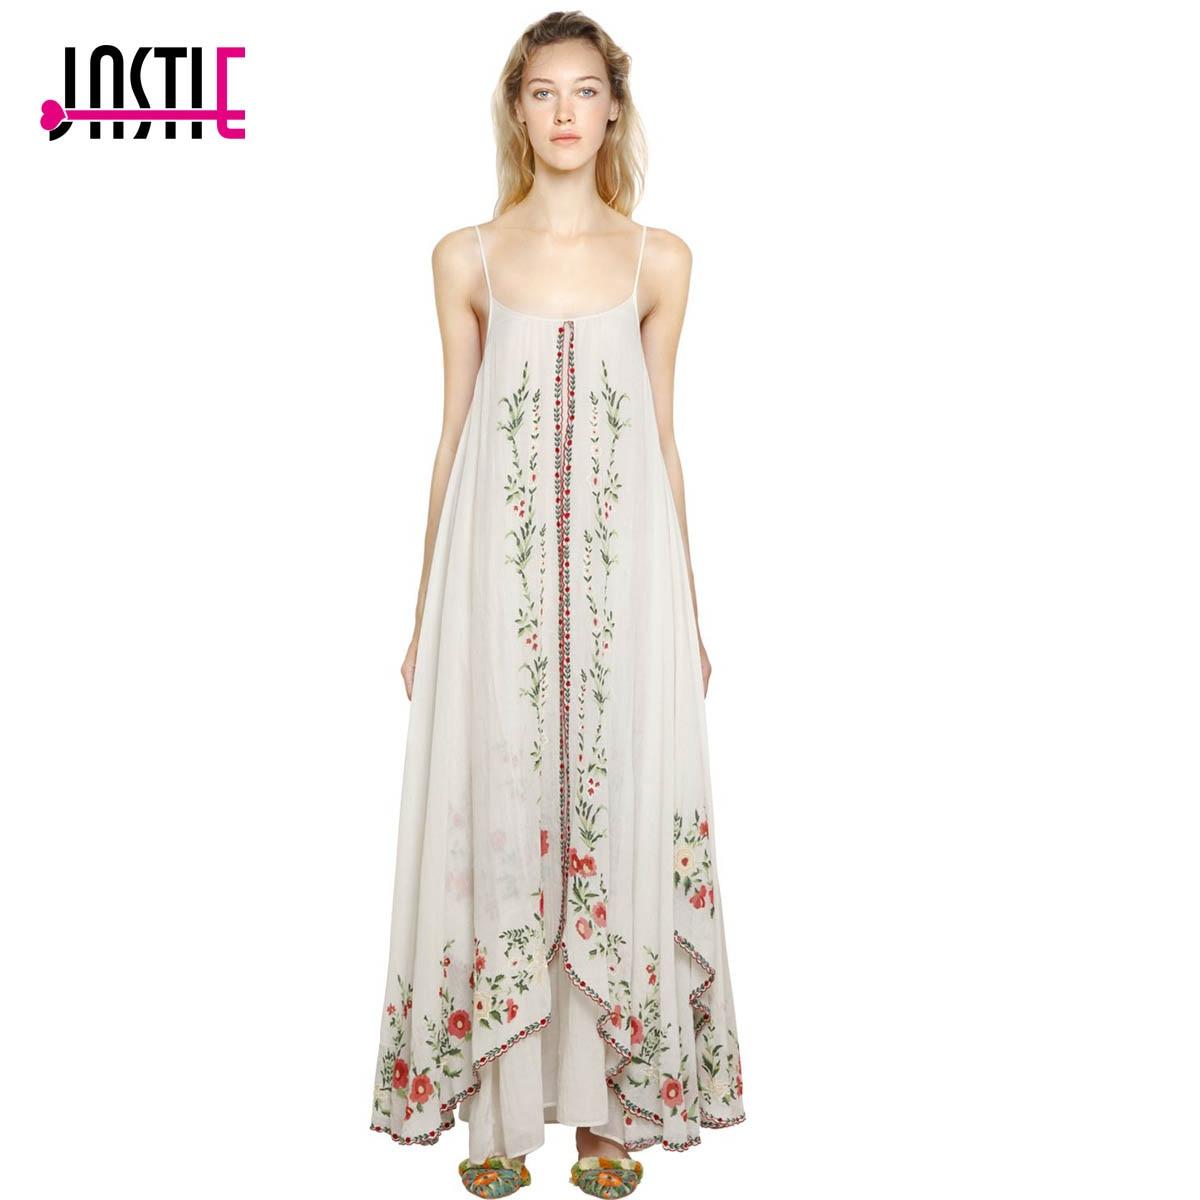 все цены на Jaatie Adjustable Straps Summer Dresses Floral Embroidered Maxi Dress Ruffle Hem Boho Dress Female Vestidos 2017 Women clothing